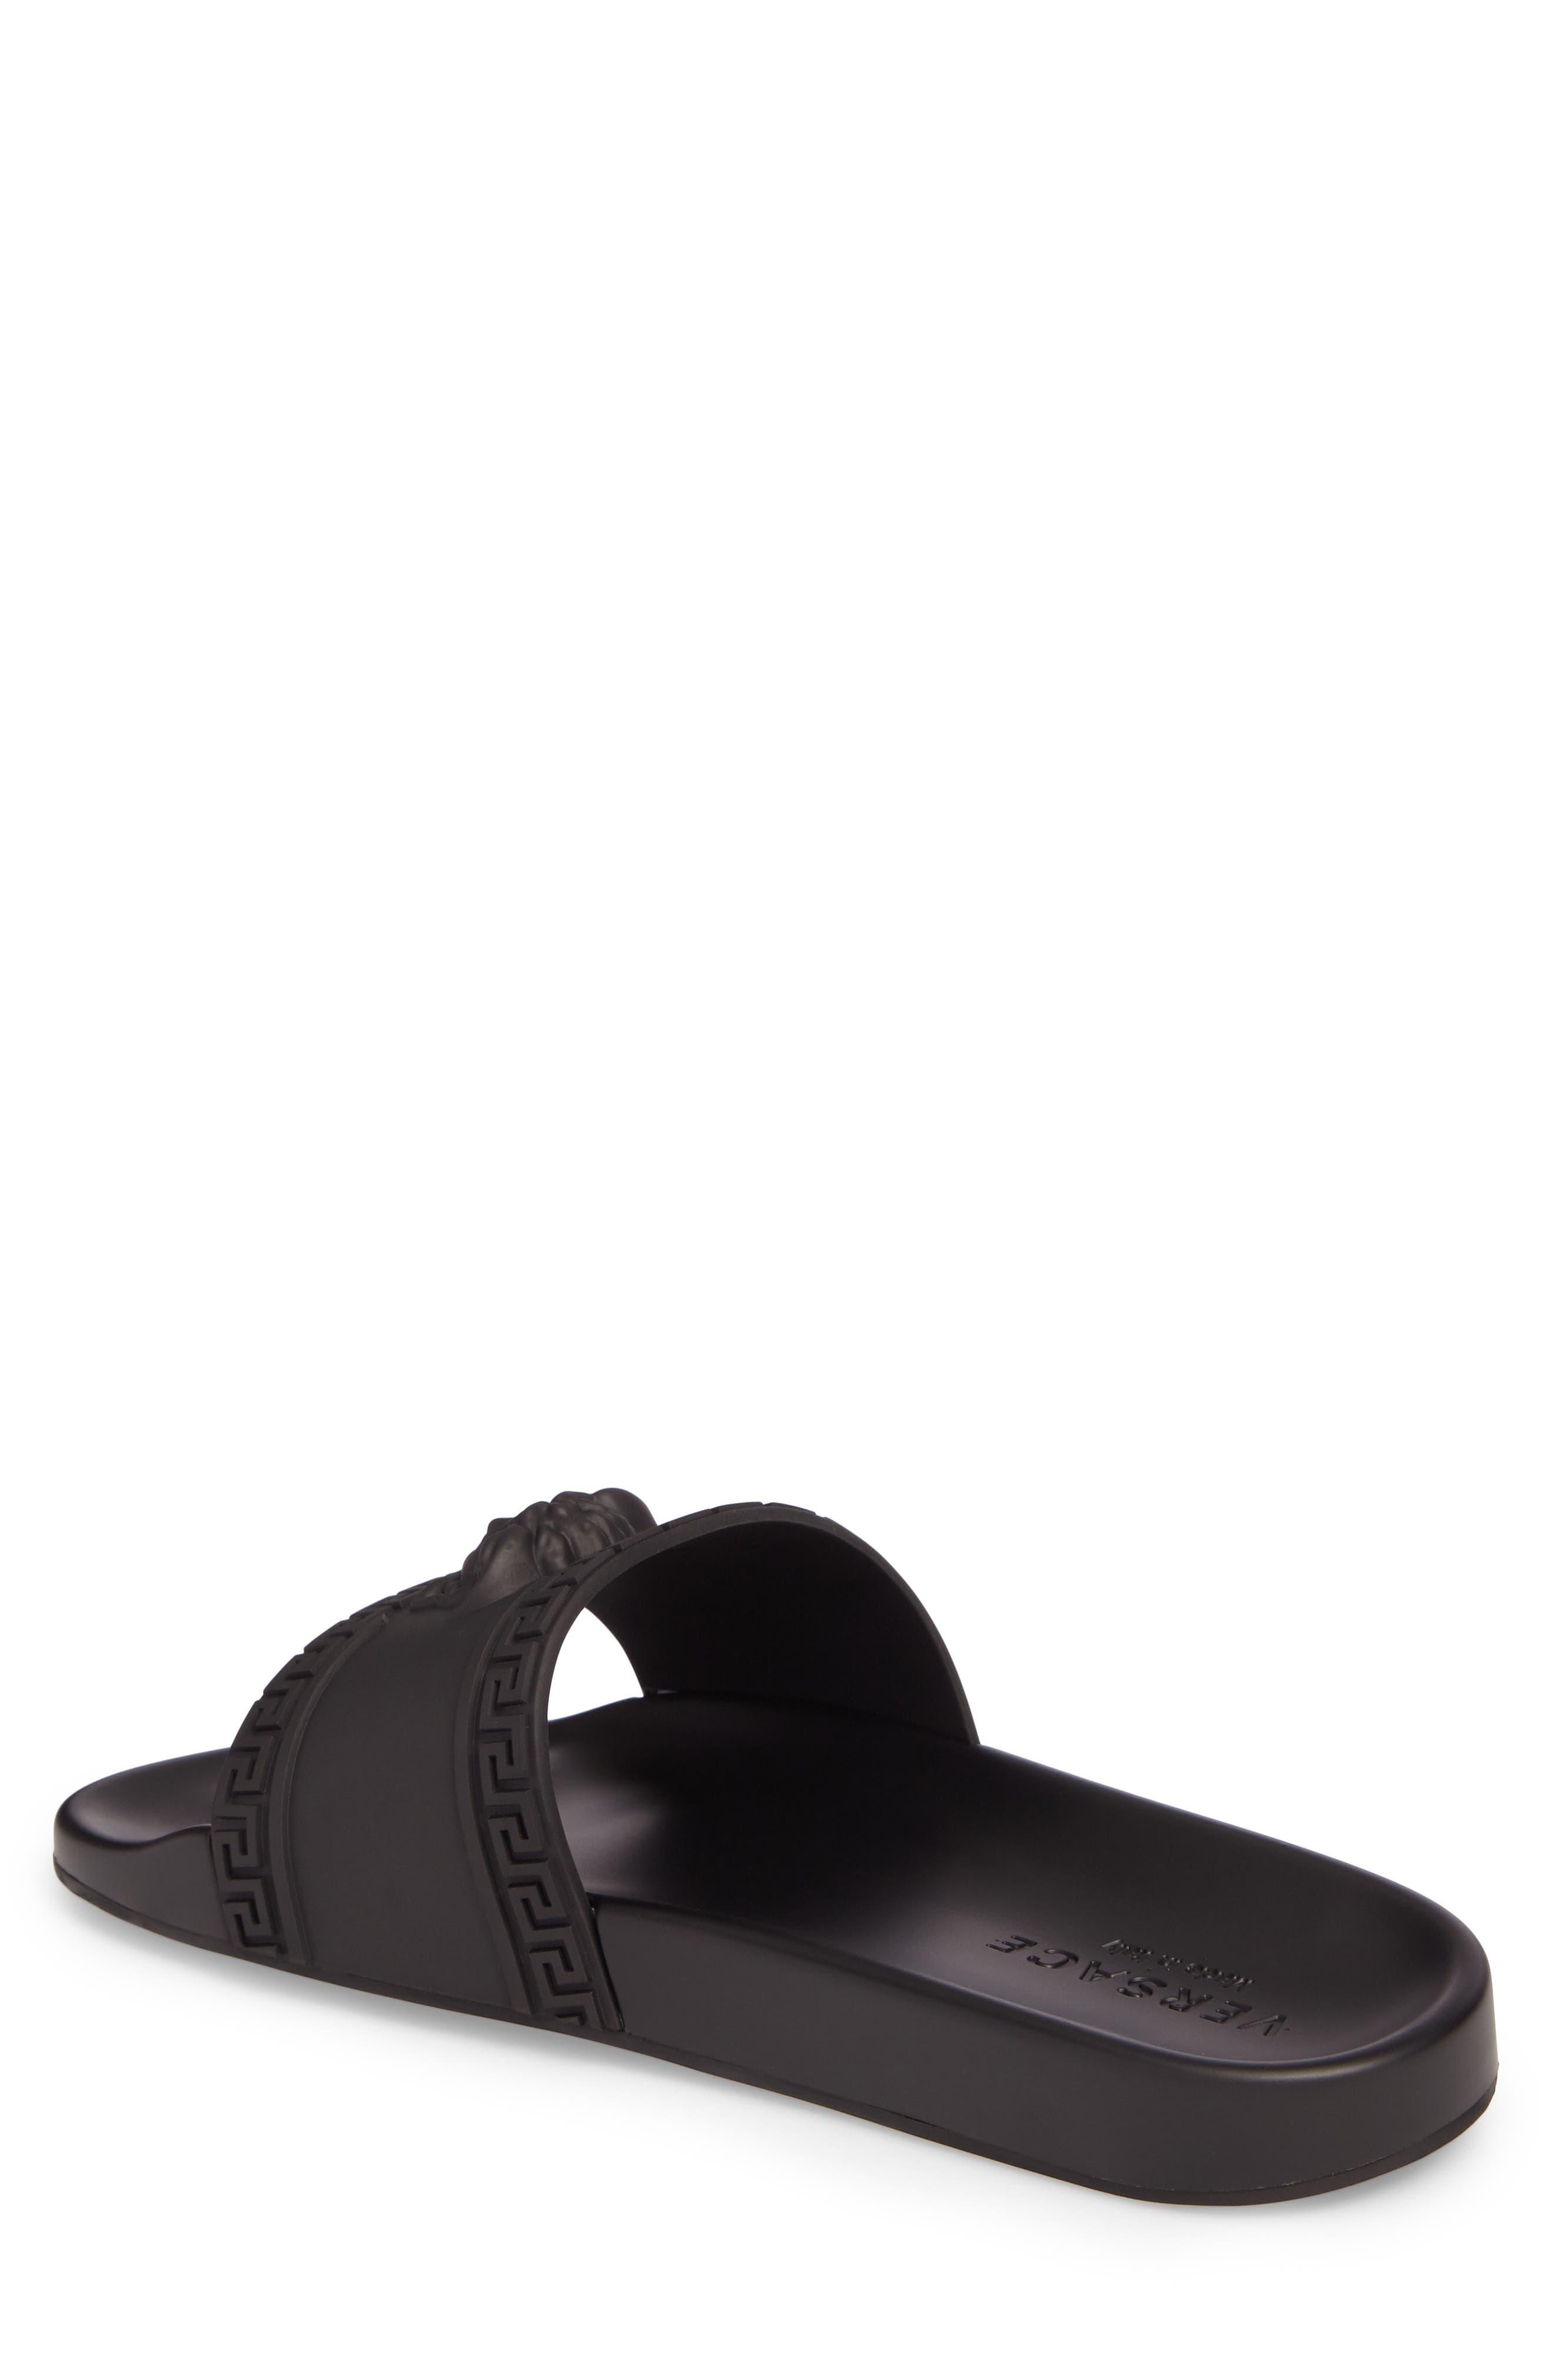 Palazzo Medusa Slide Sandal,                             Alternate thumbnail 2, color,                             Black